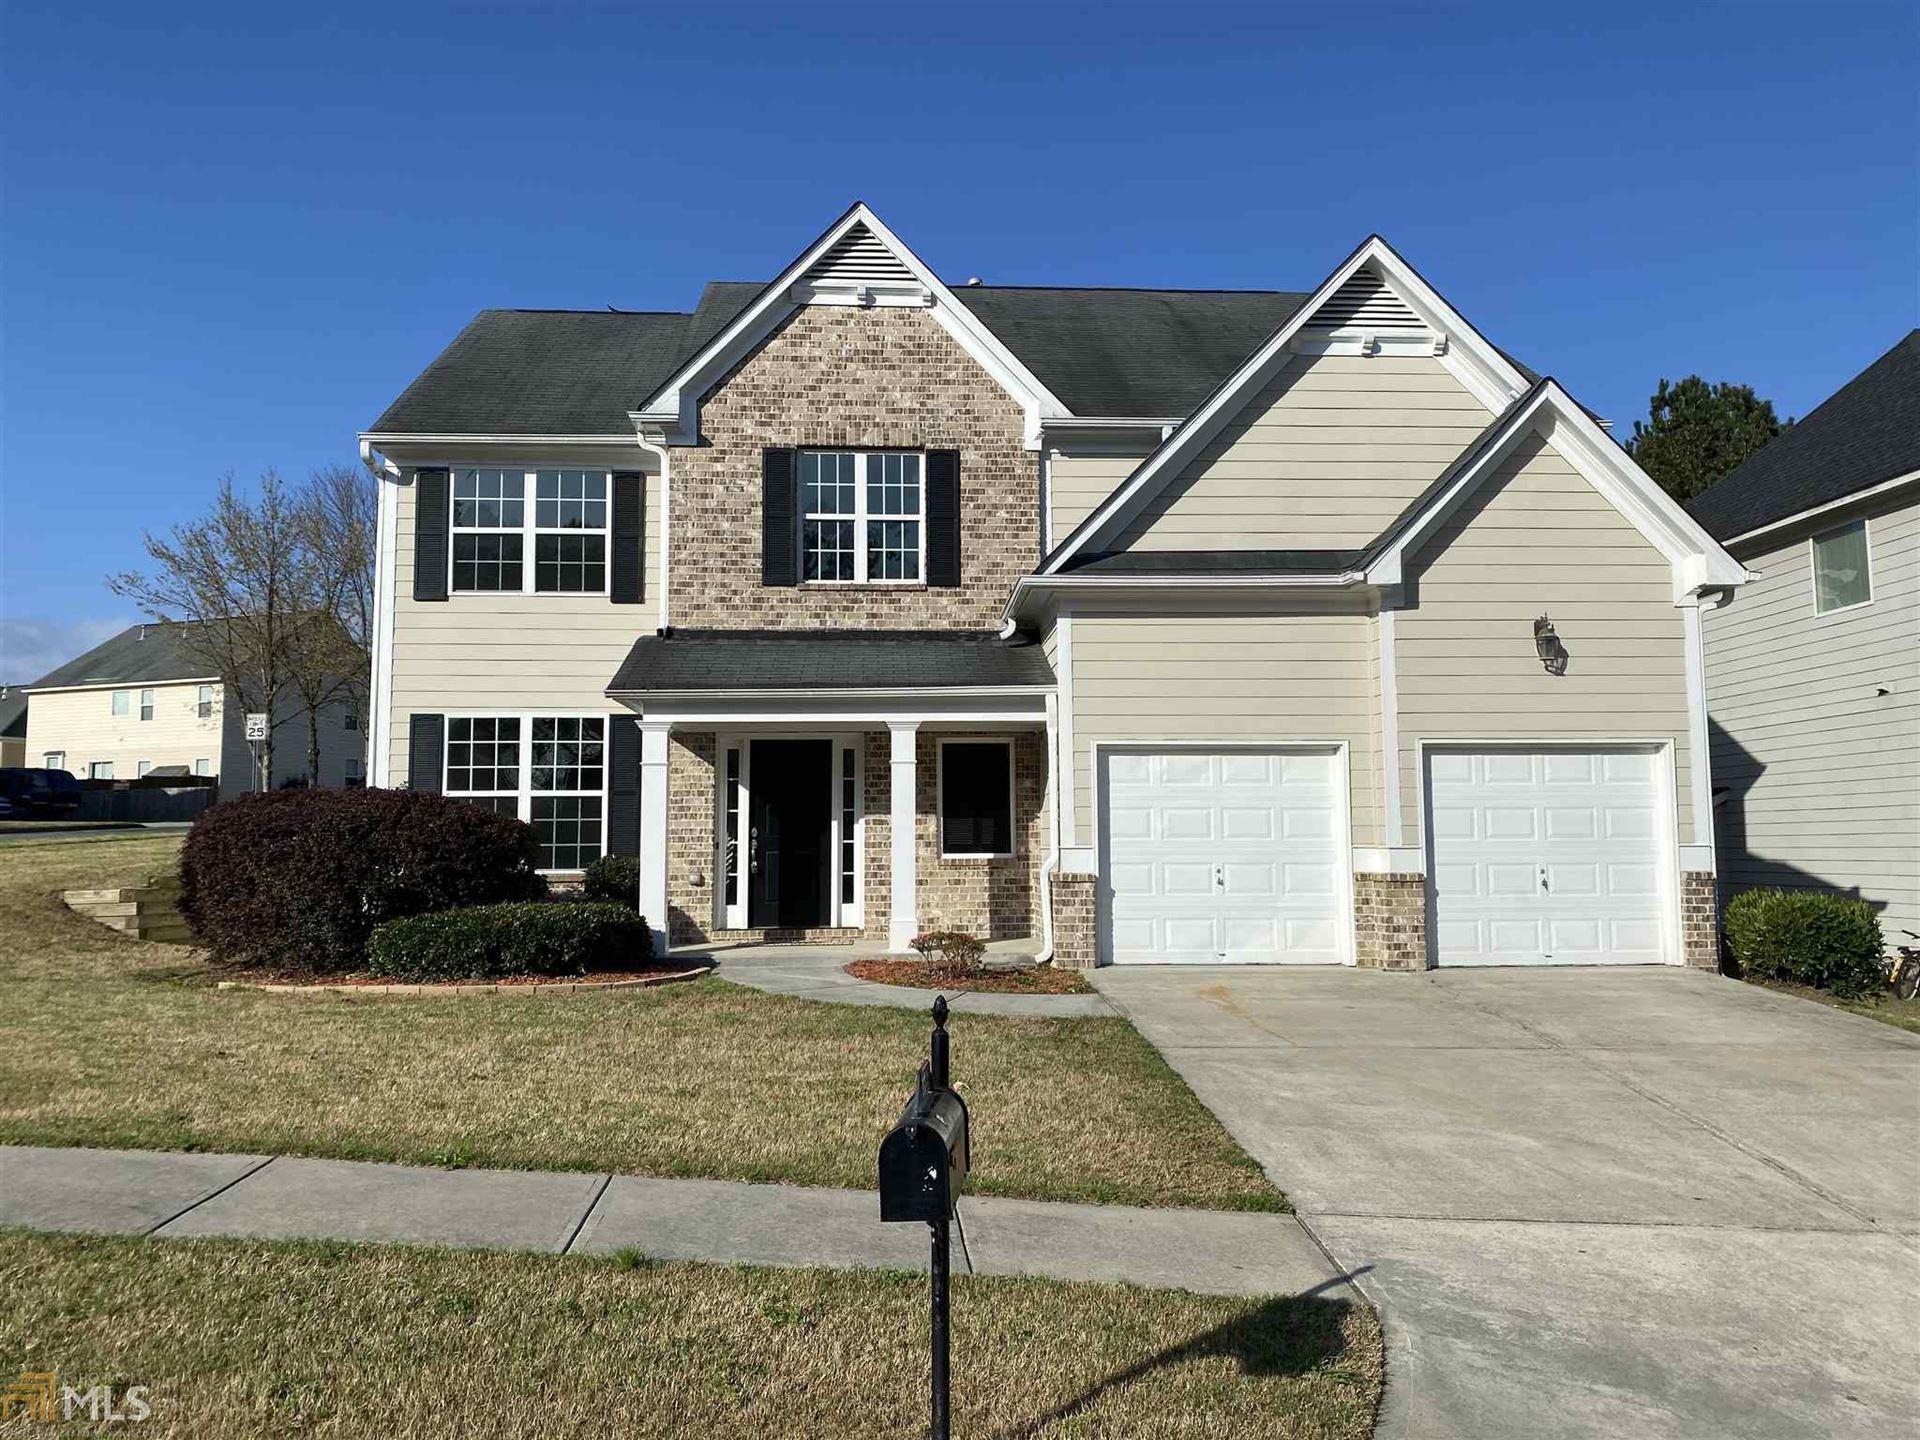 1103 Simonton Hill Ct, Lawrenceville, GA 30045 - #: 8951863